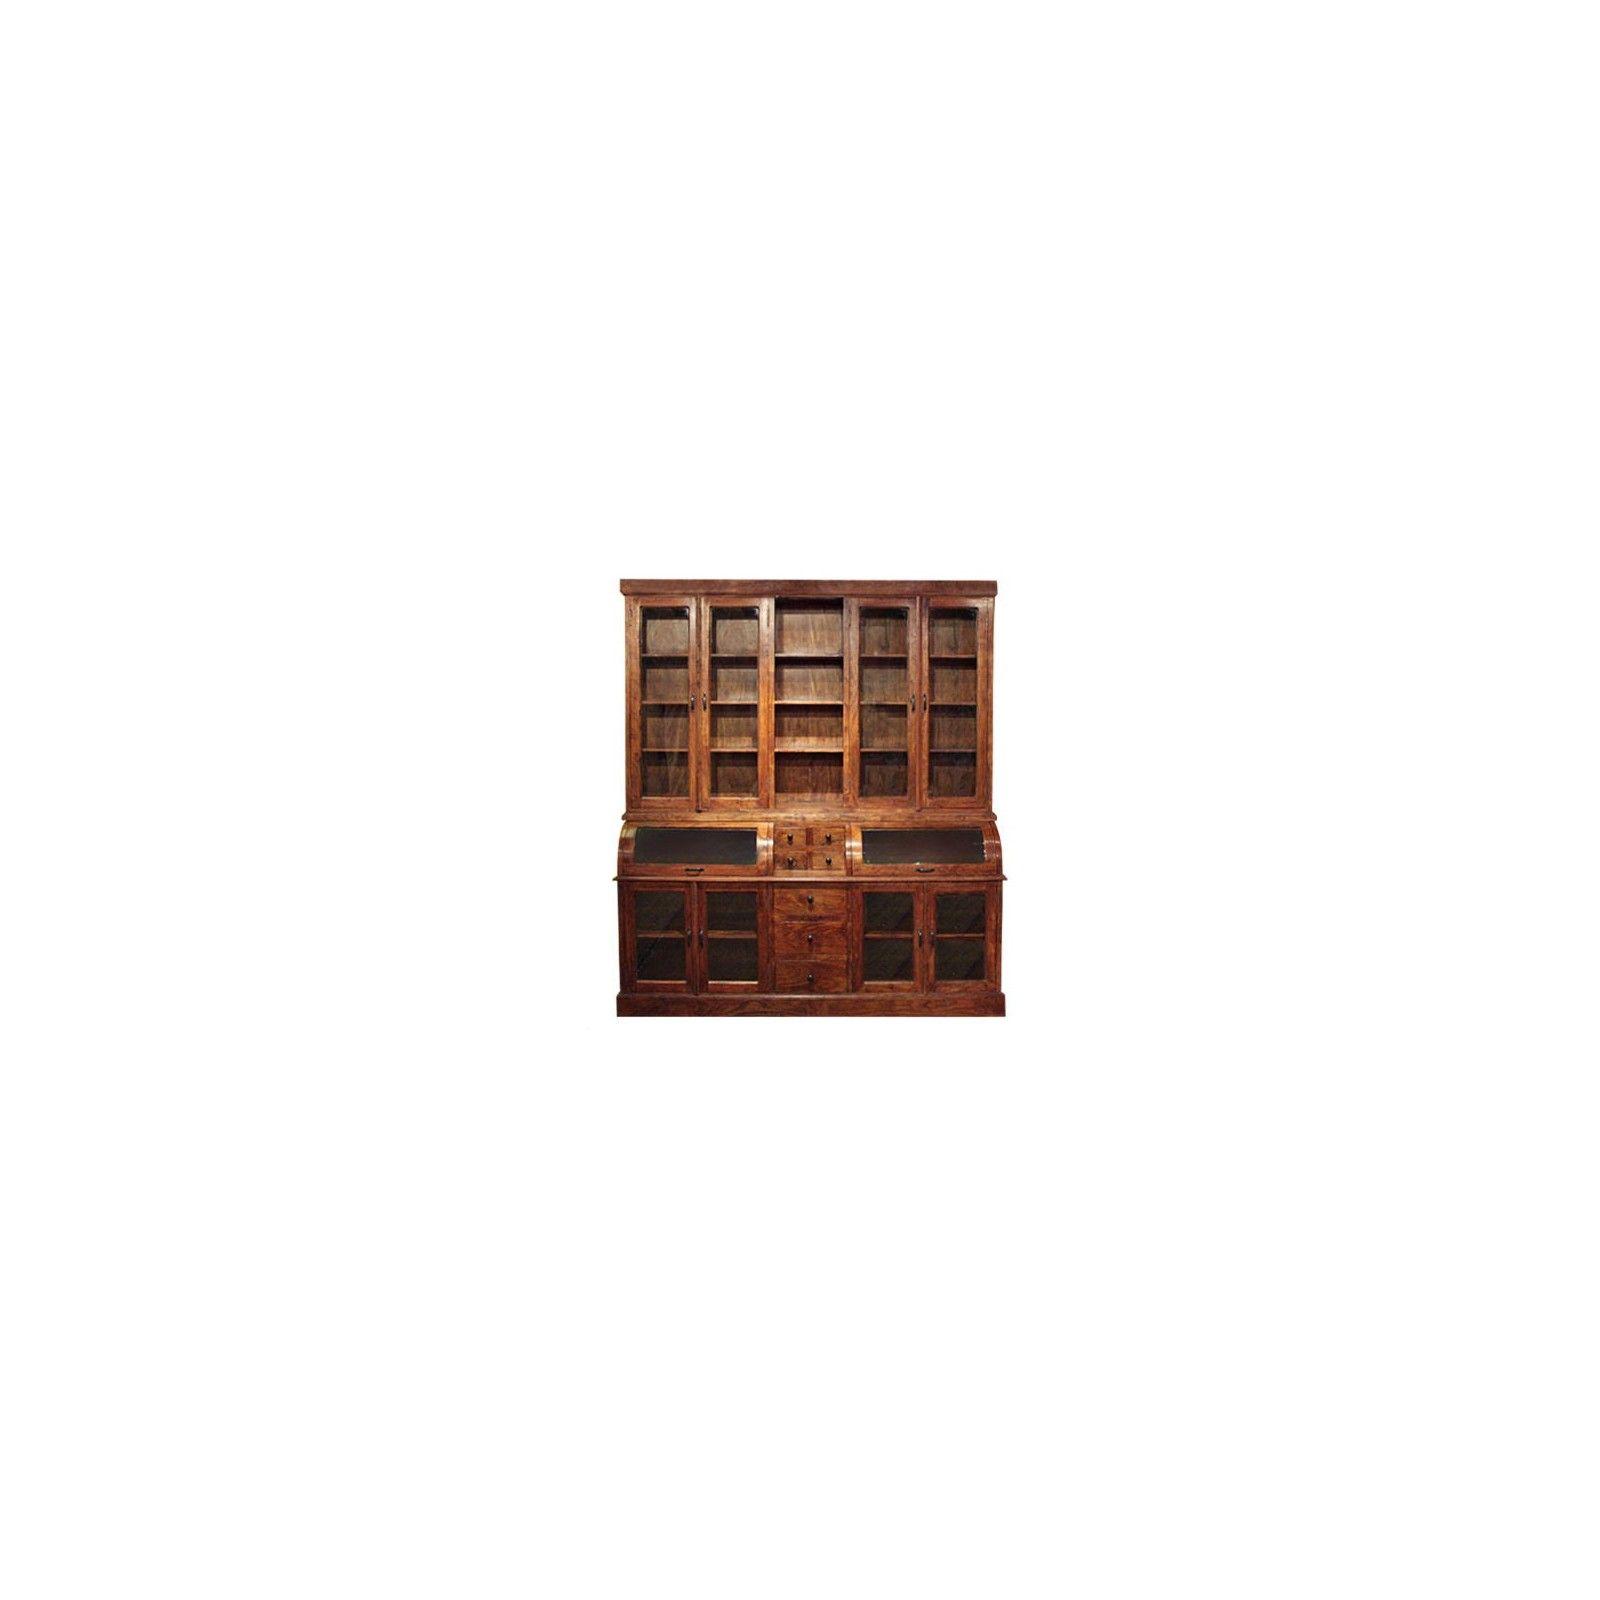 CARA Bibliothèque 2 corps moyen modèle Bibliothèques - 6